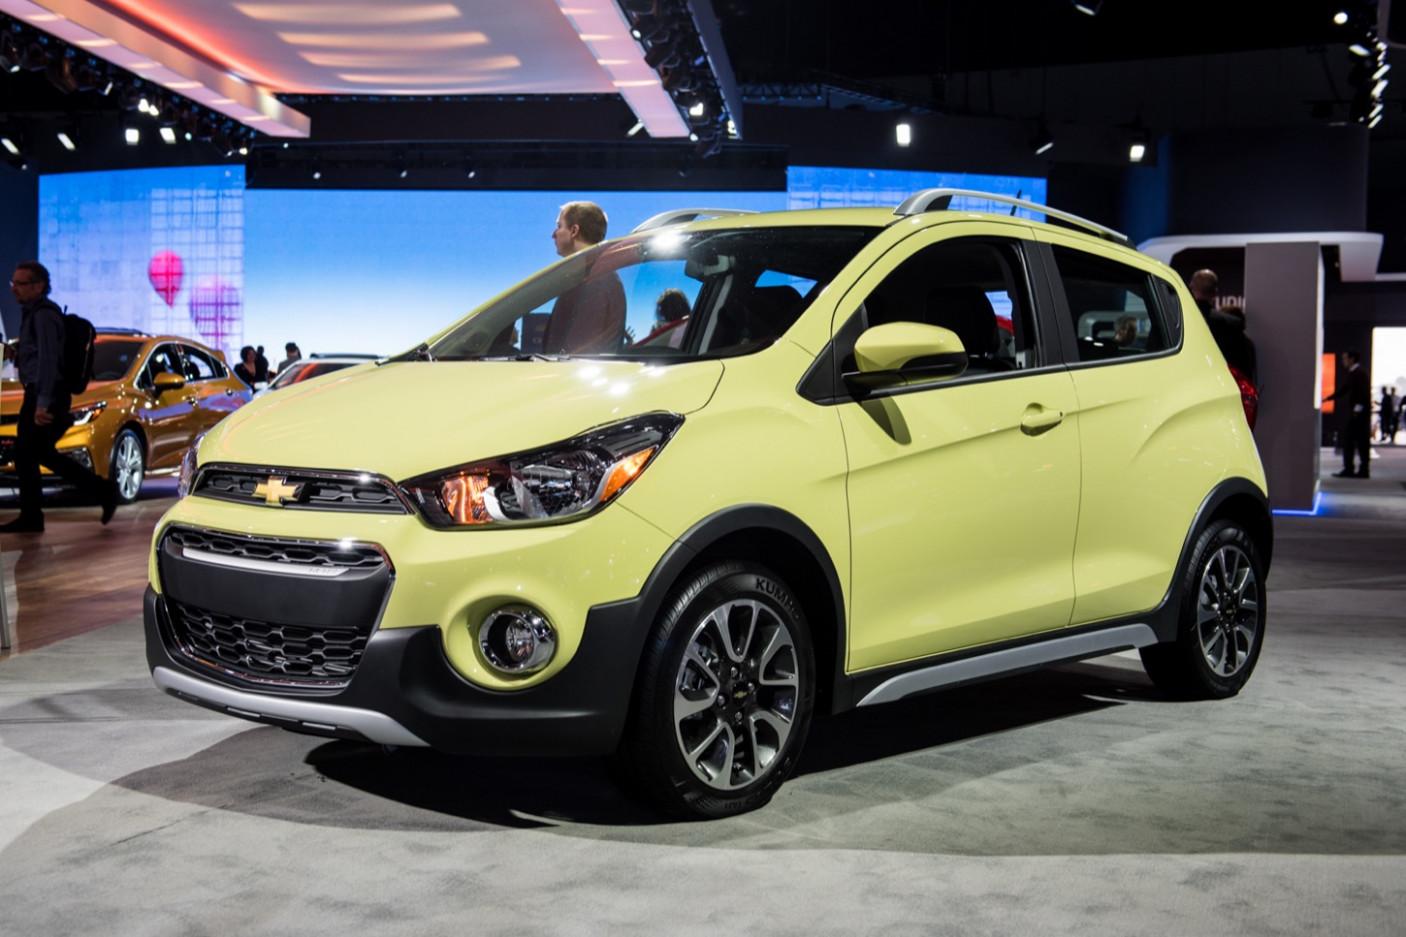 Pricing 2022 Chevrolet Spark